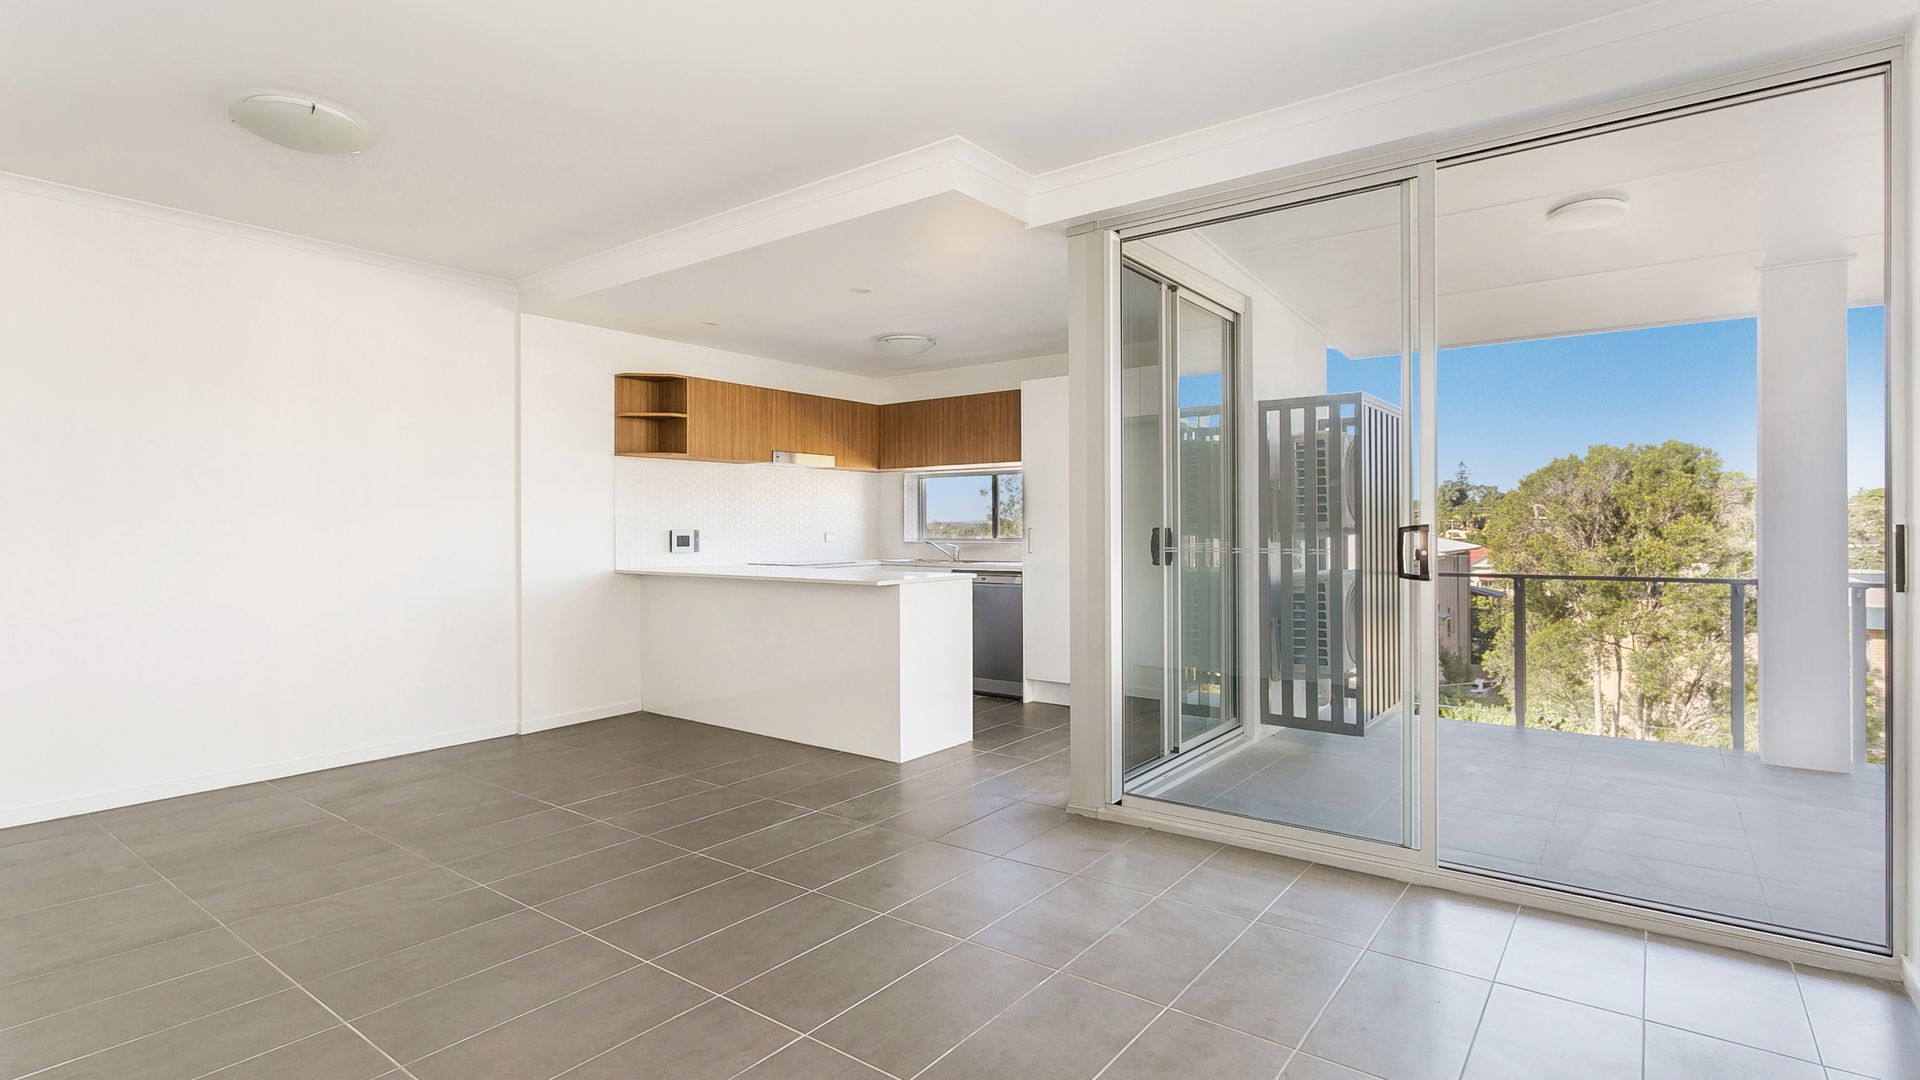 304/60 Hood Street, Sherwood QLD 4075, Image 2